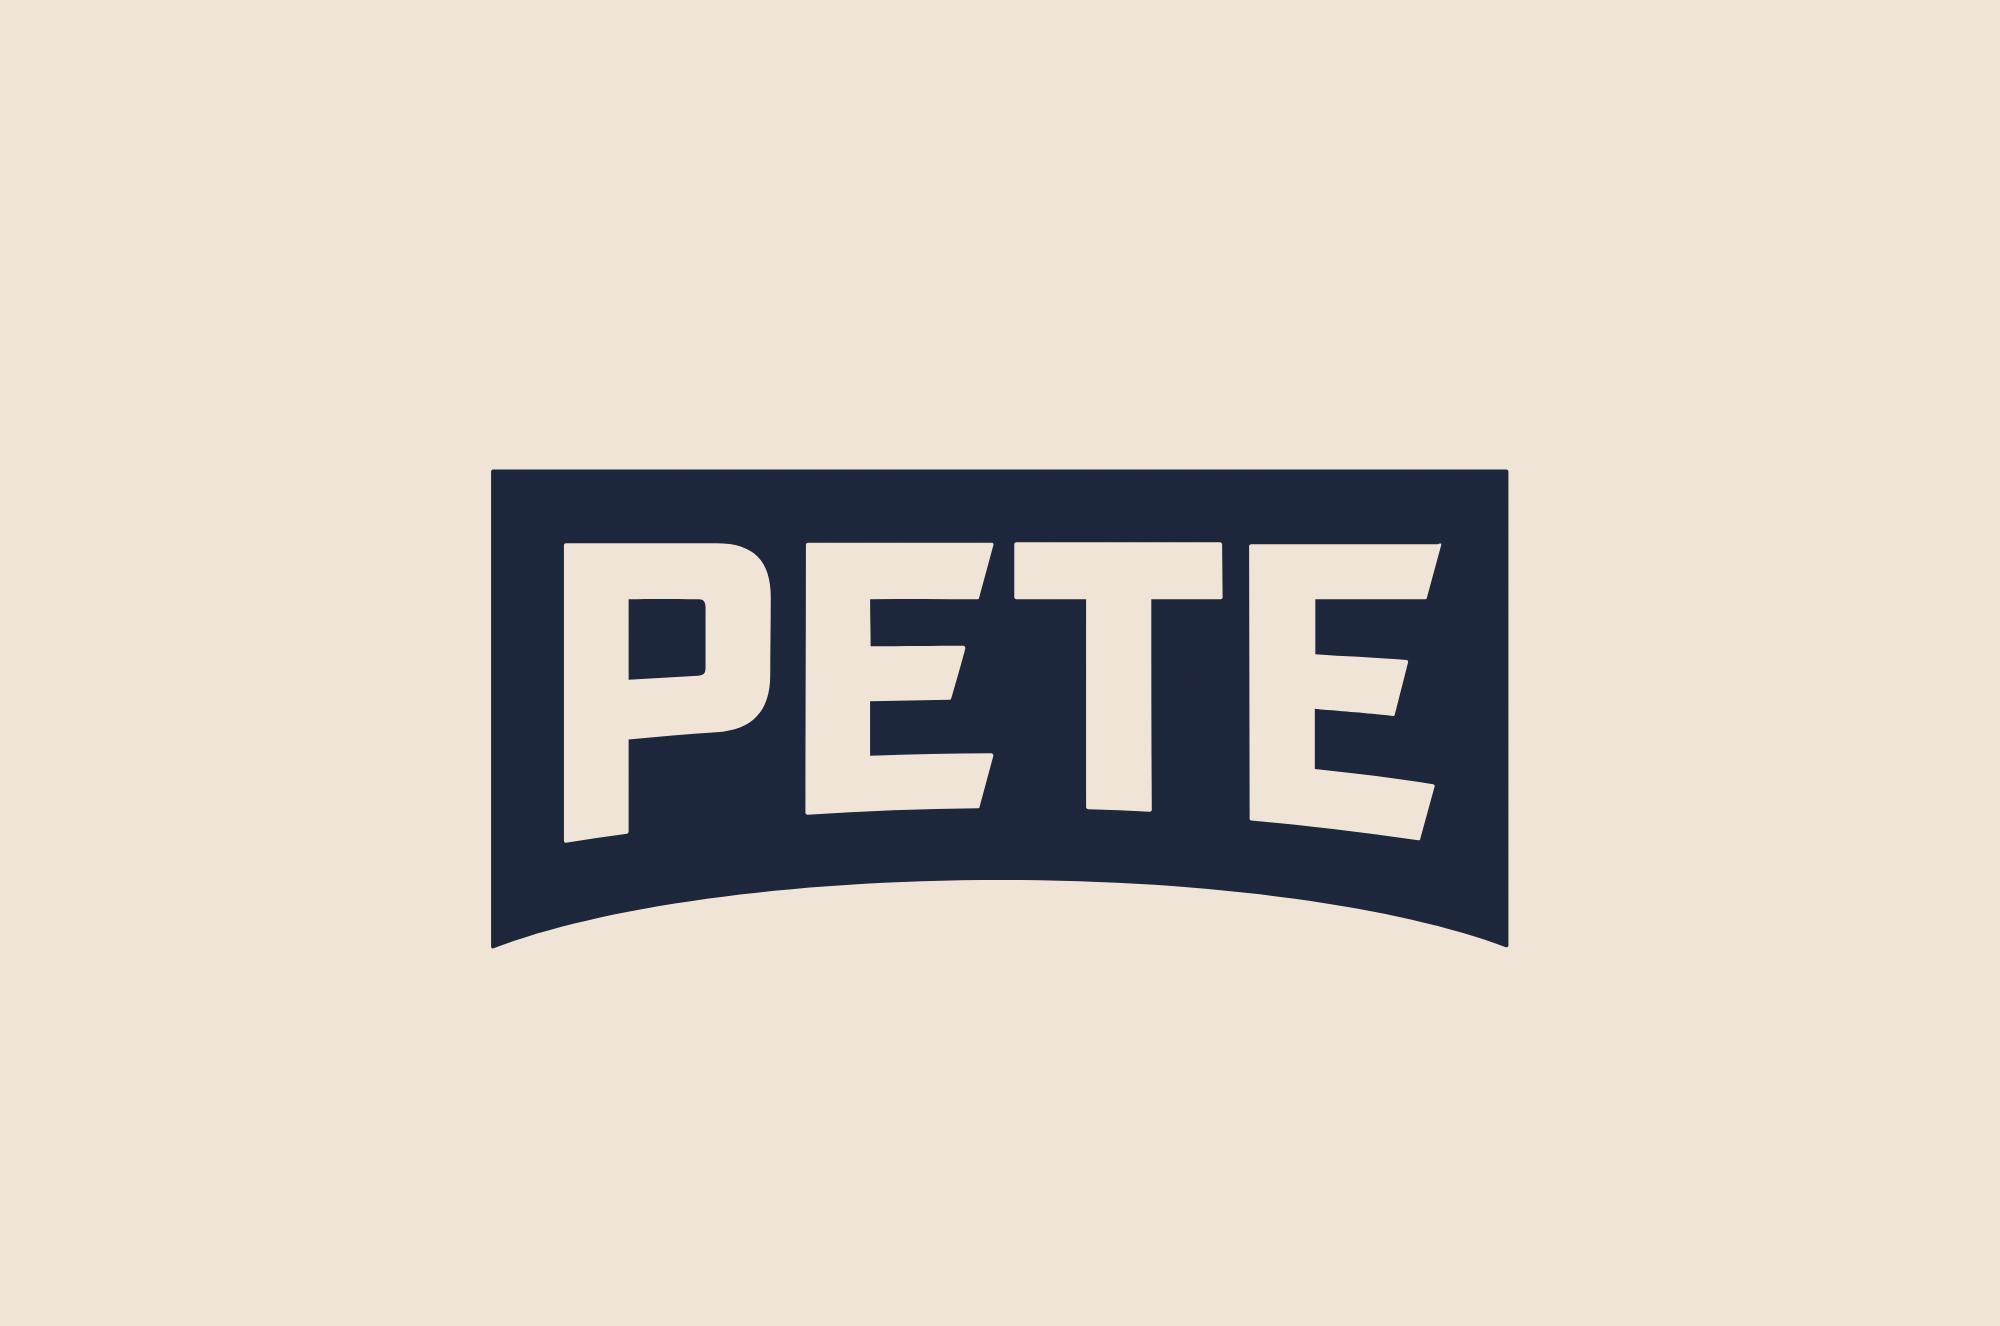 Brand New New Logo And Identity For Pete Buttigieg By Hyperakt Water Under The Bridge Identity Logo Pub Logo